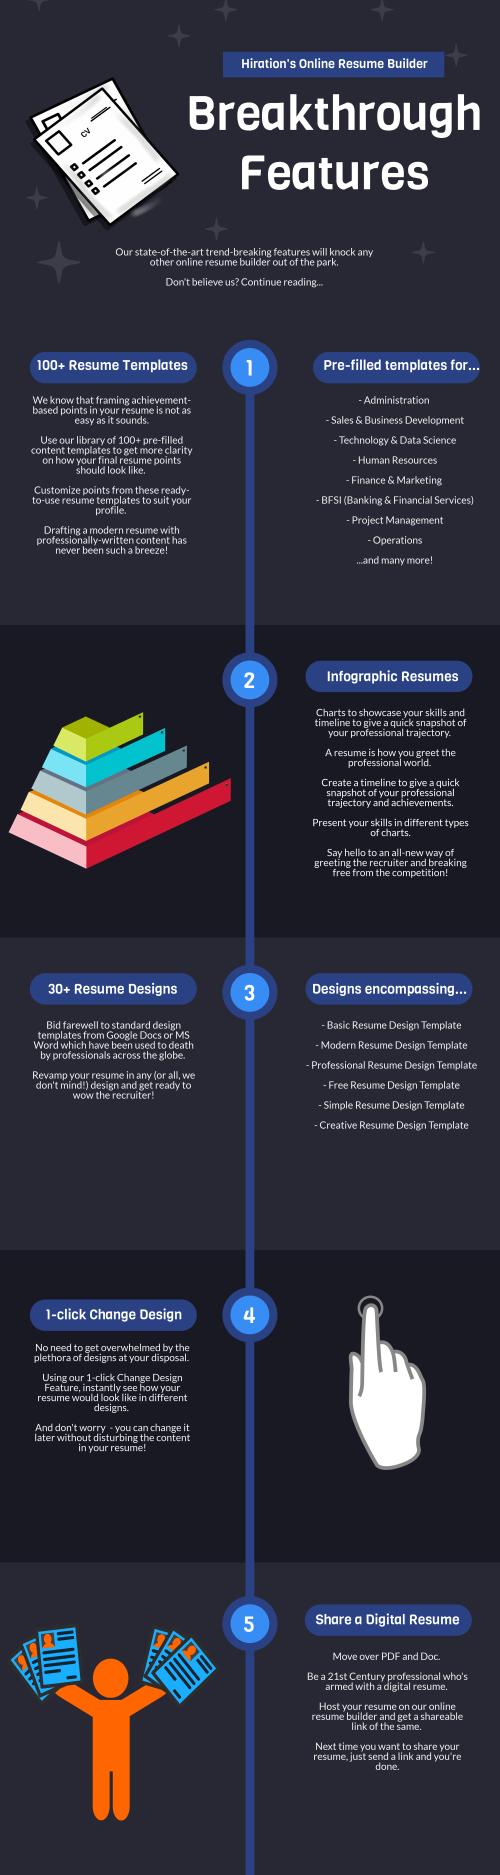 hiration-best-resume-builder-infographic-1